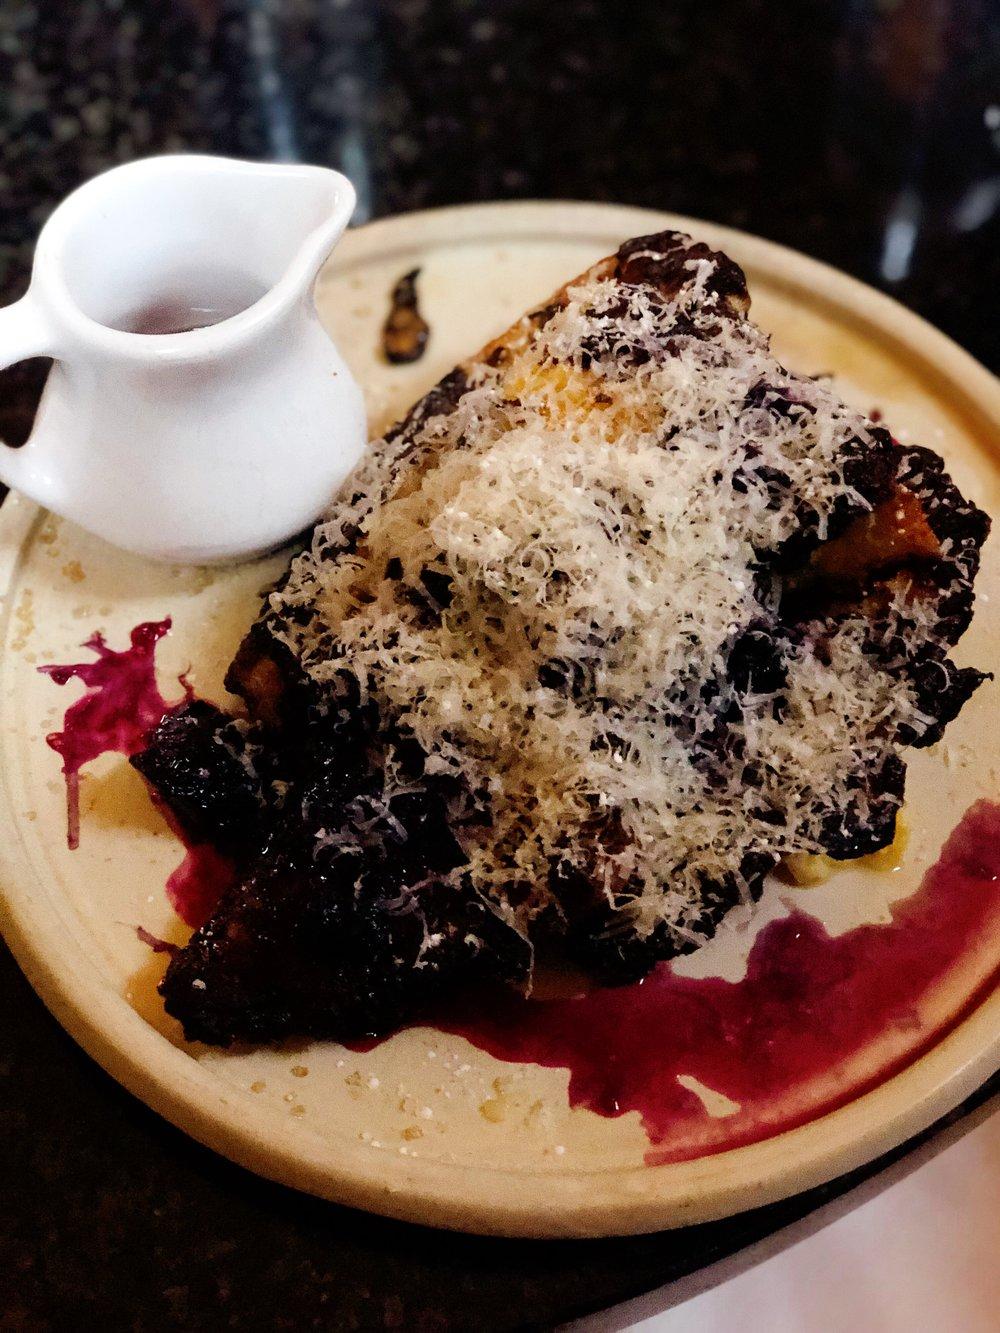 Pain Perdu: House Brioche + Shaved Kenny's Aged Asiago + Blackberries + Bourbon Powdered Sugar